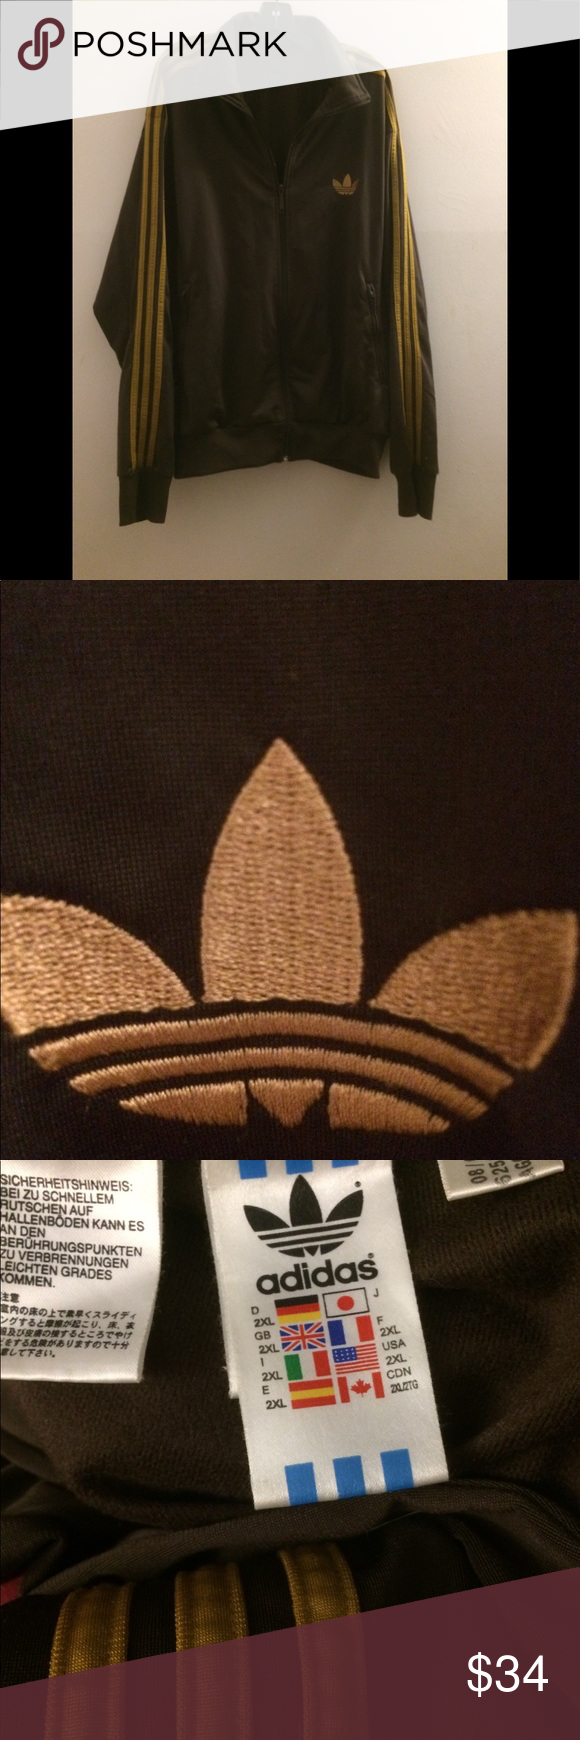 Adidas 3 stripe Original Brown And Gold Adidas Starter